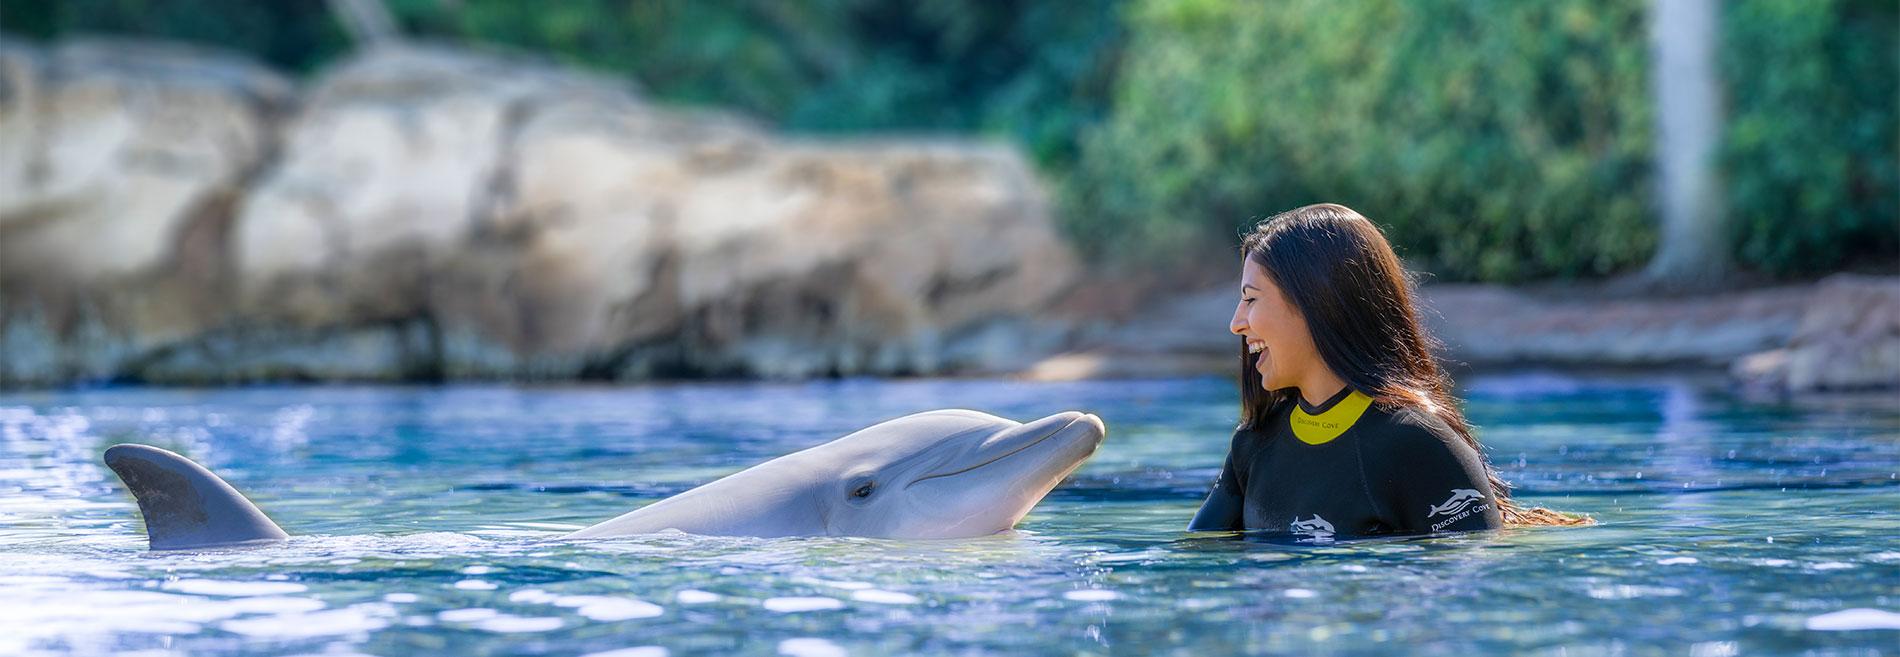 Dolphin Lagoon at Discovery Cove Orlando